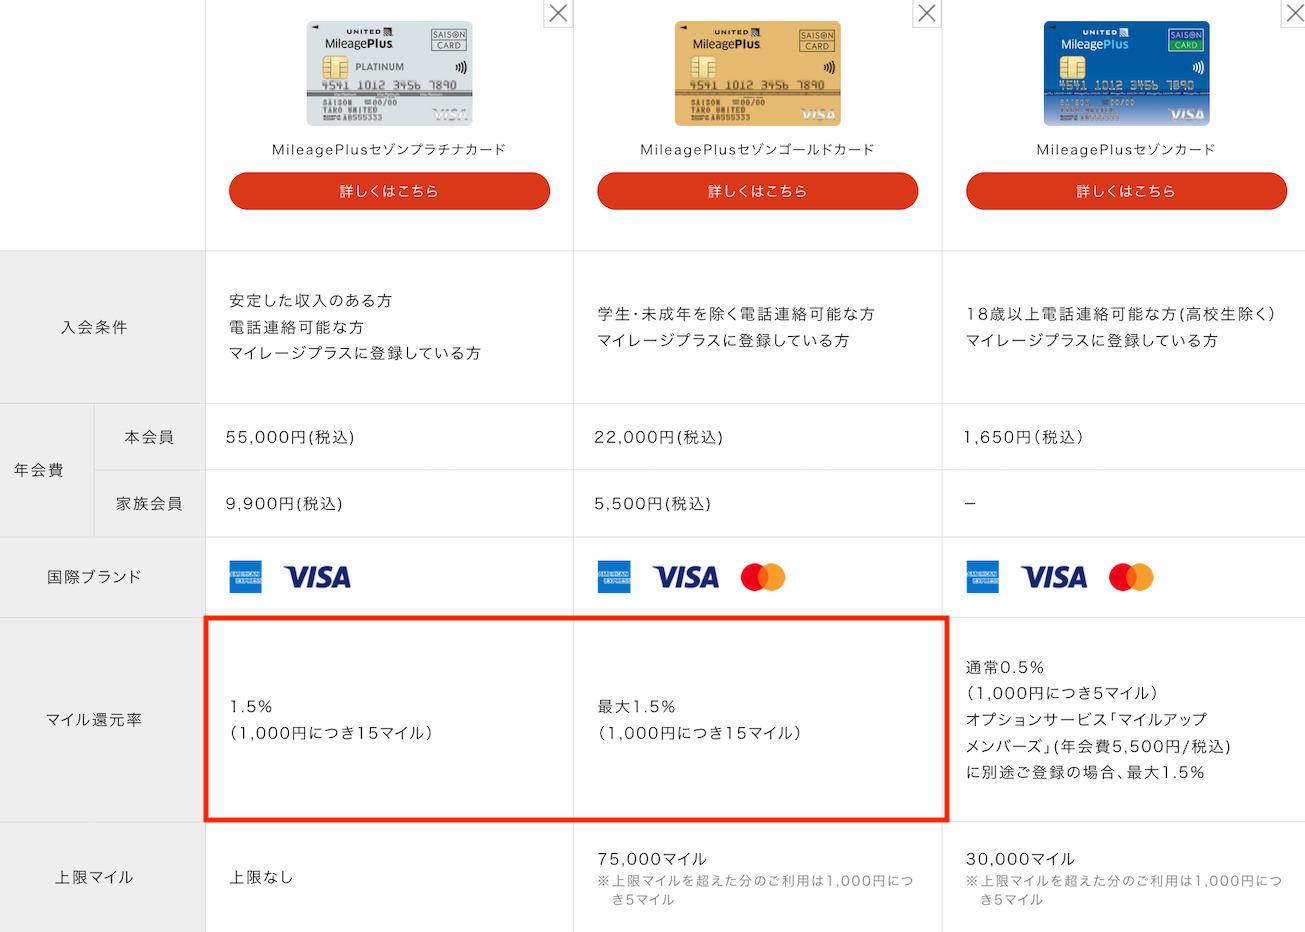 MileagePlusカードのラインナップと特徴